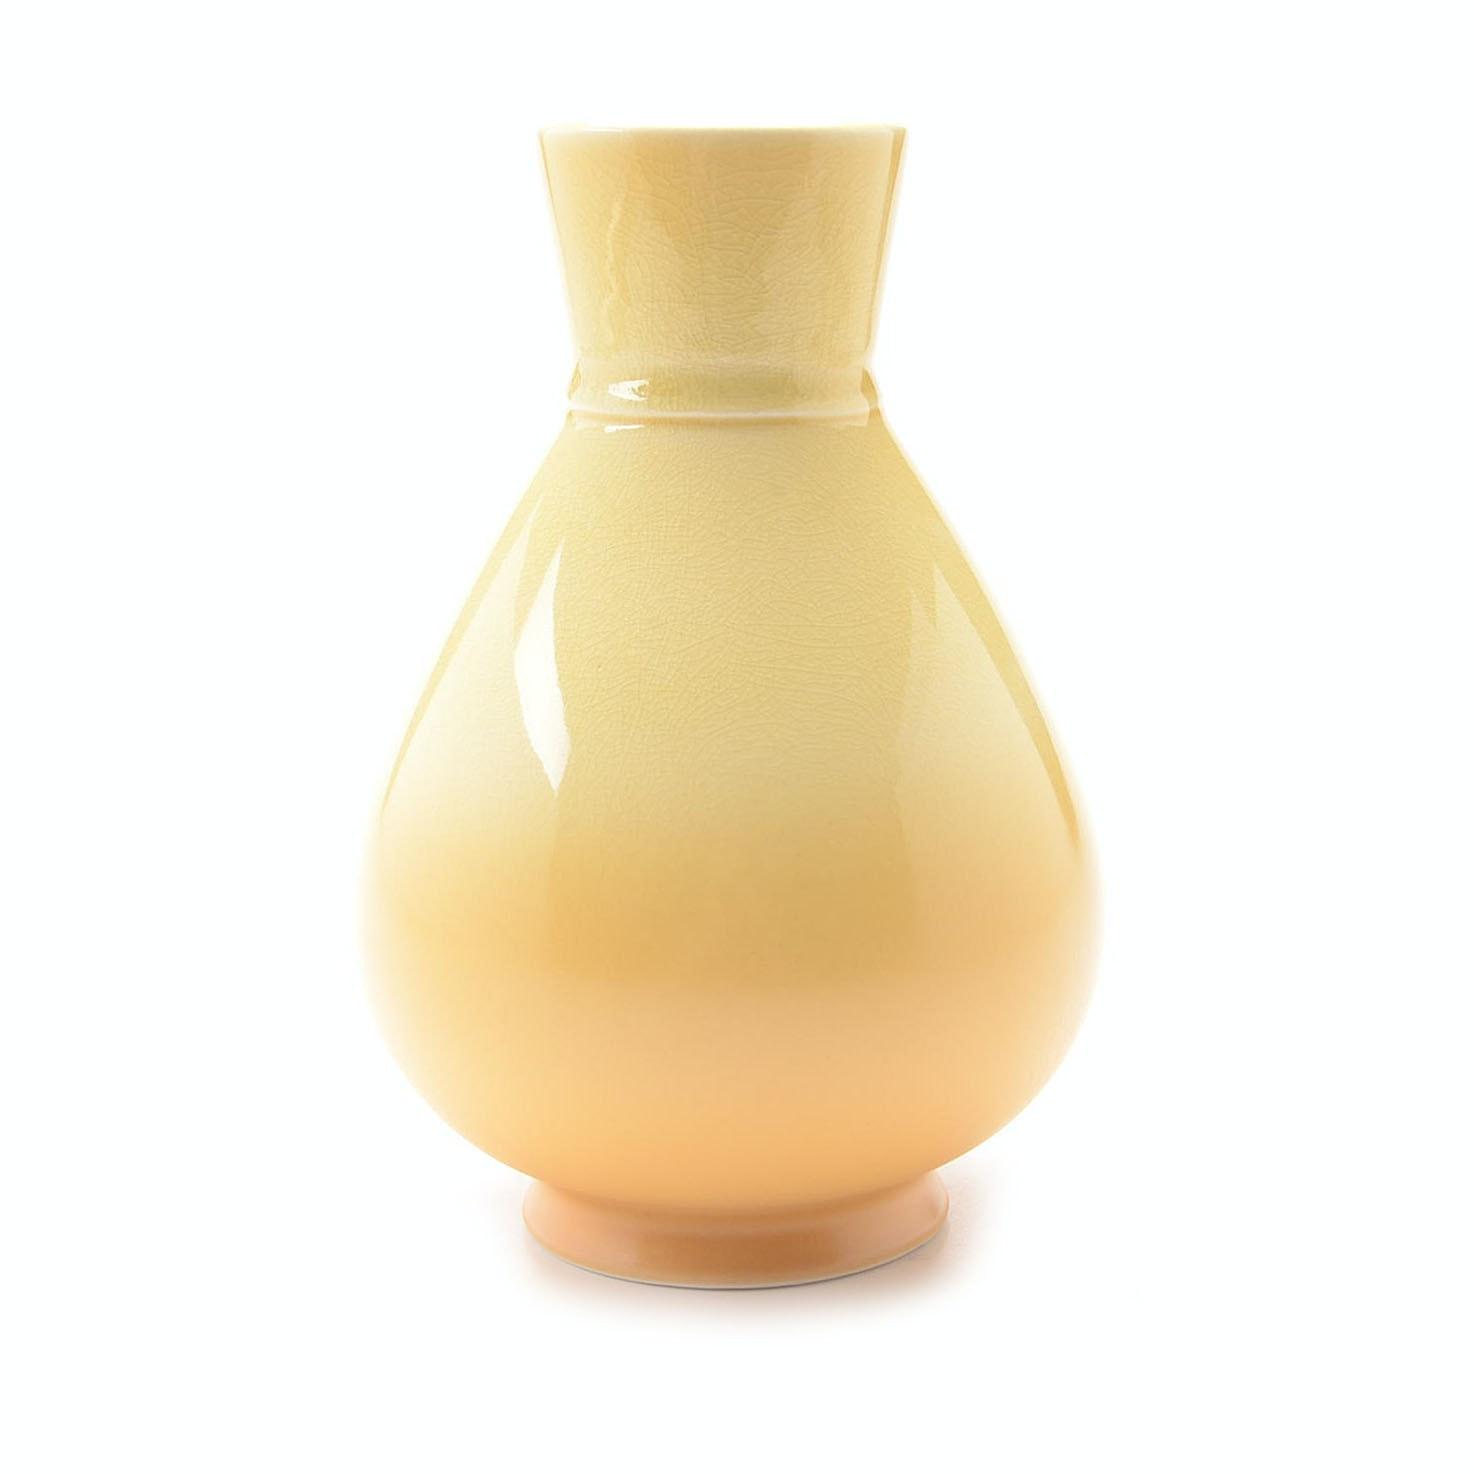 Rookwood Art Pottery Yellow Teardrop Vase